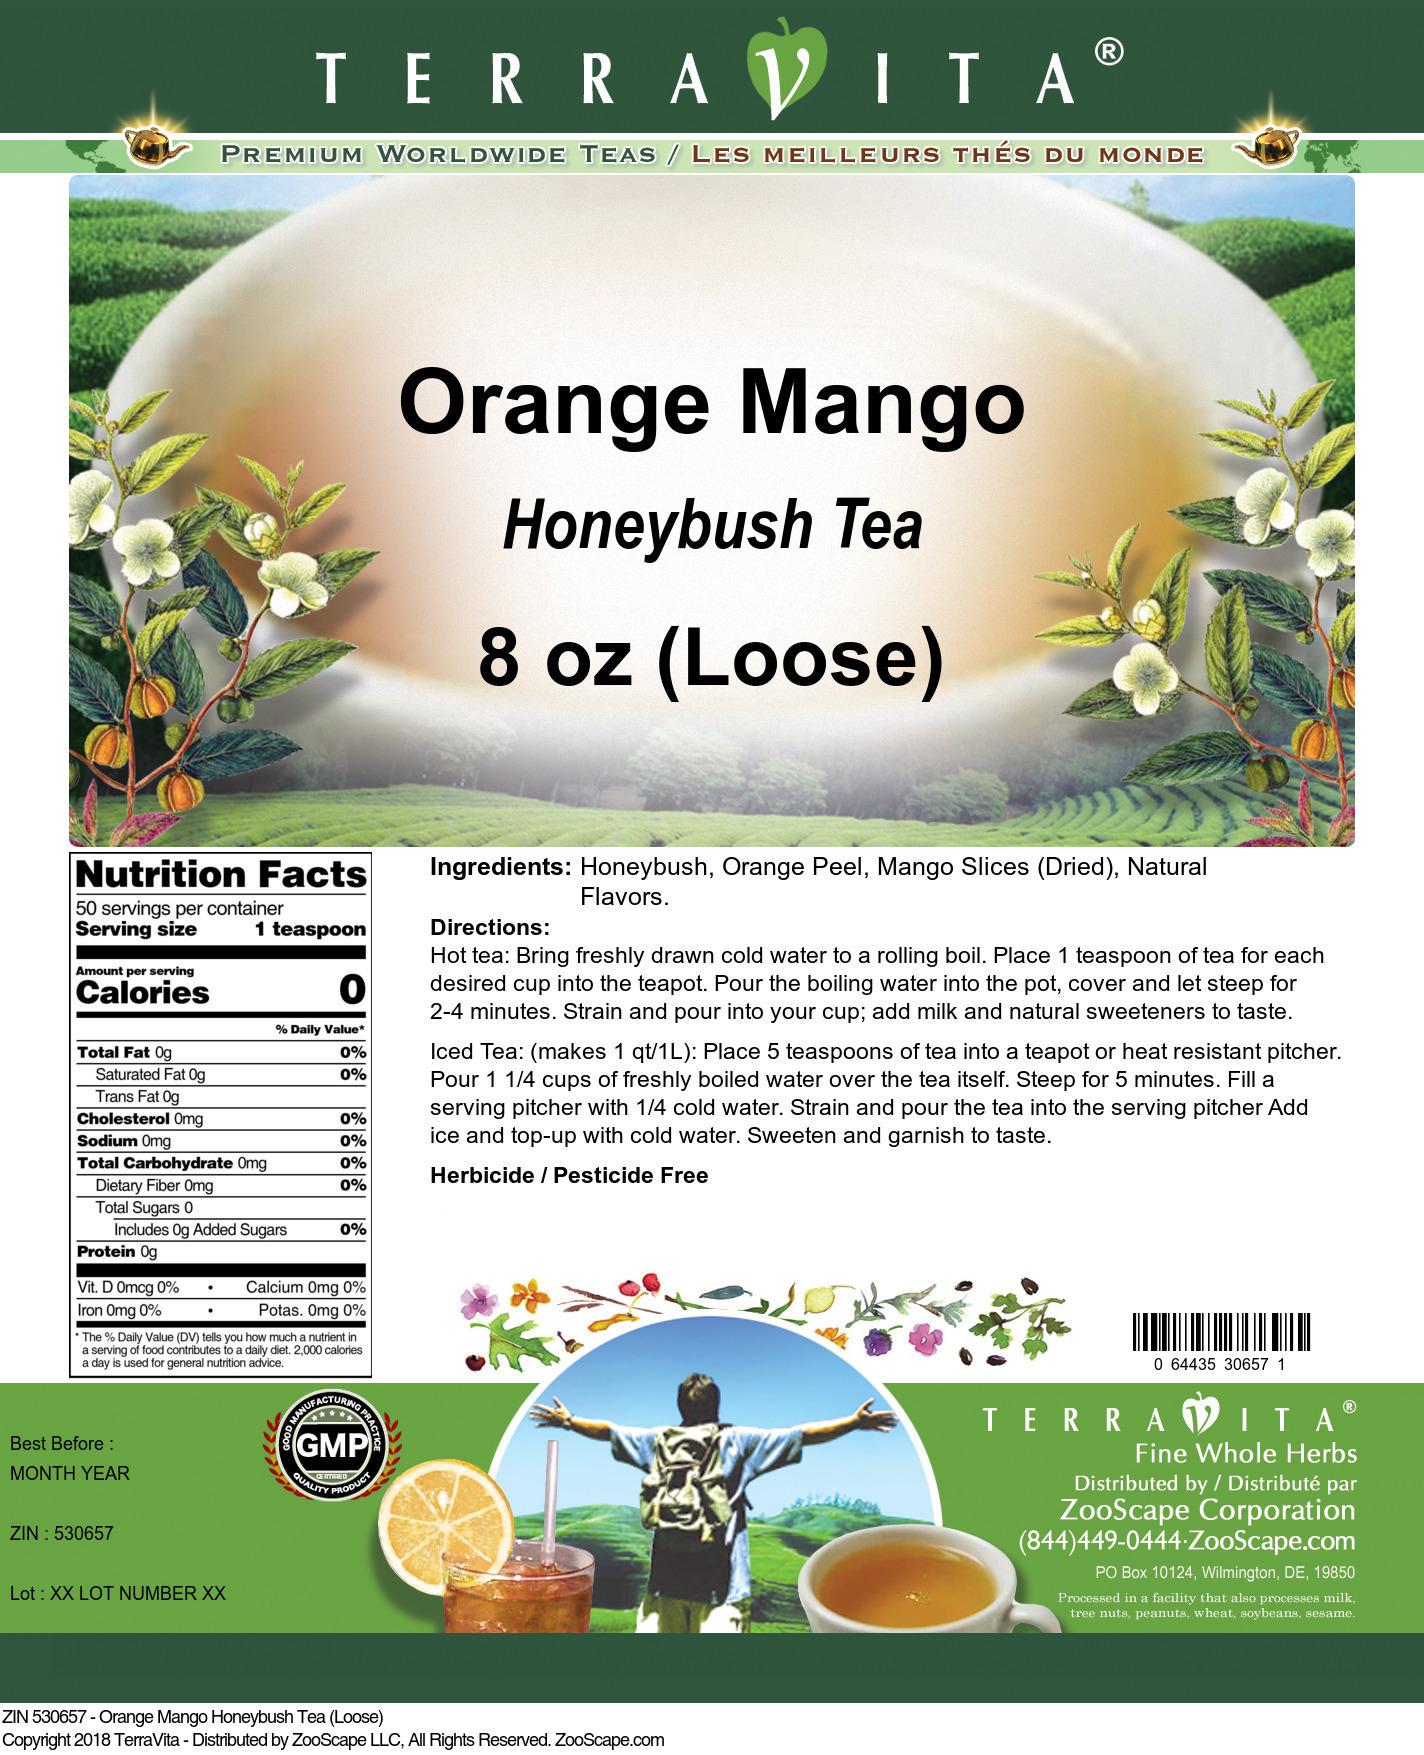 Orange Mango Honeybush Tea (Loose)